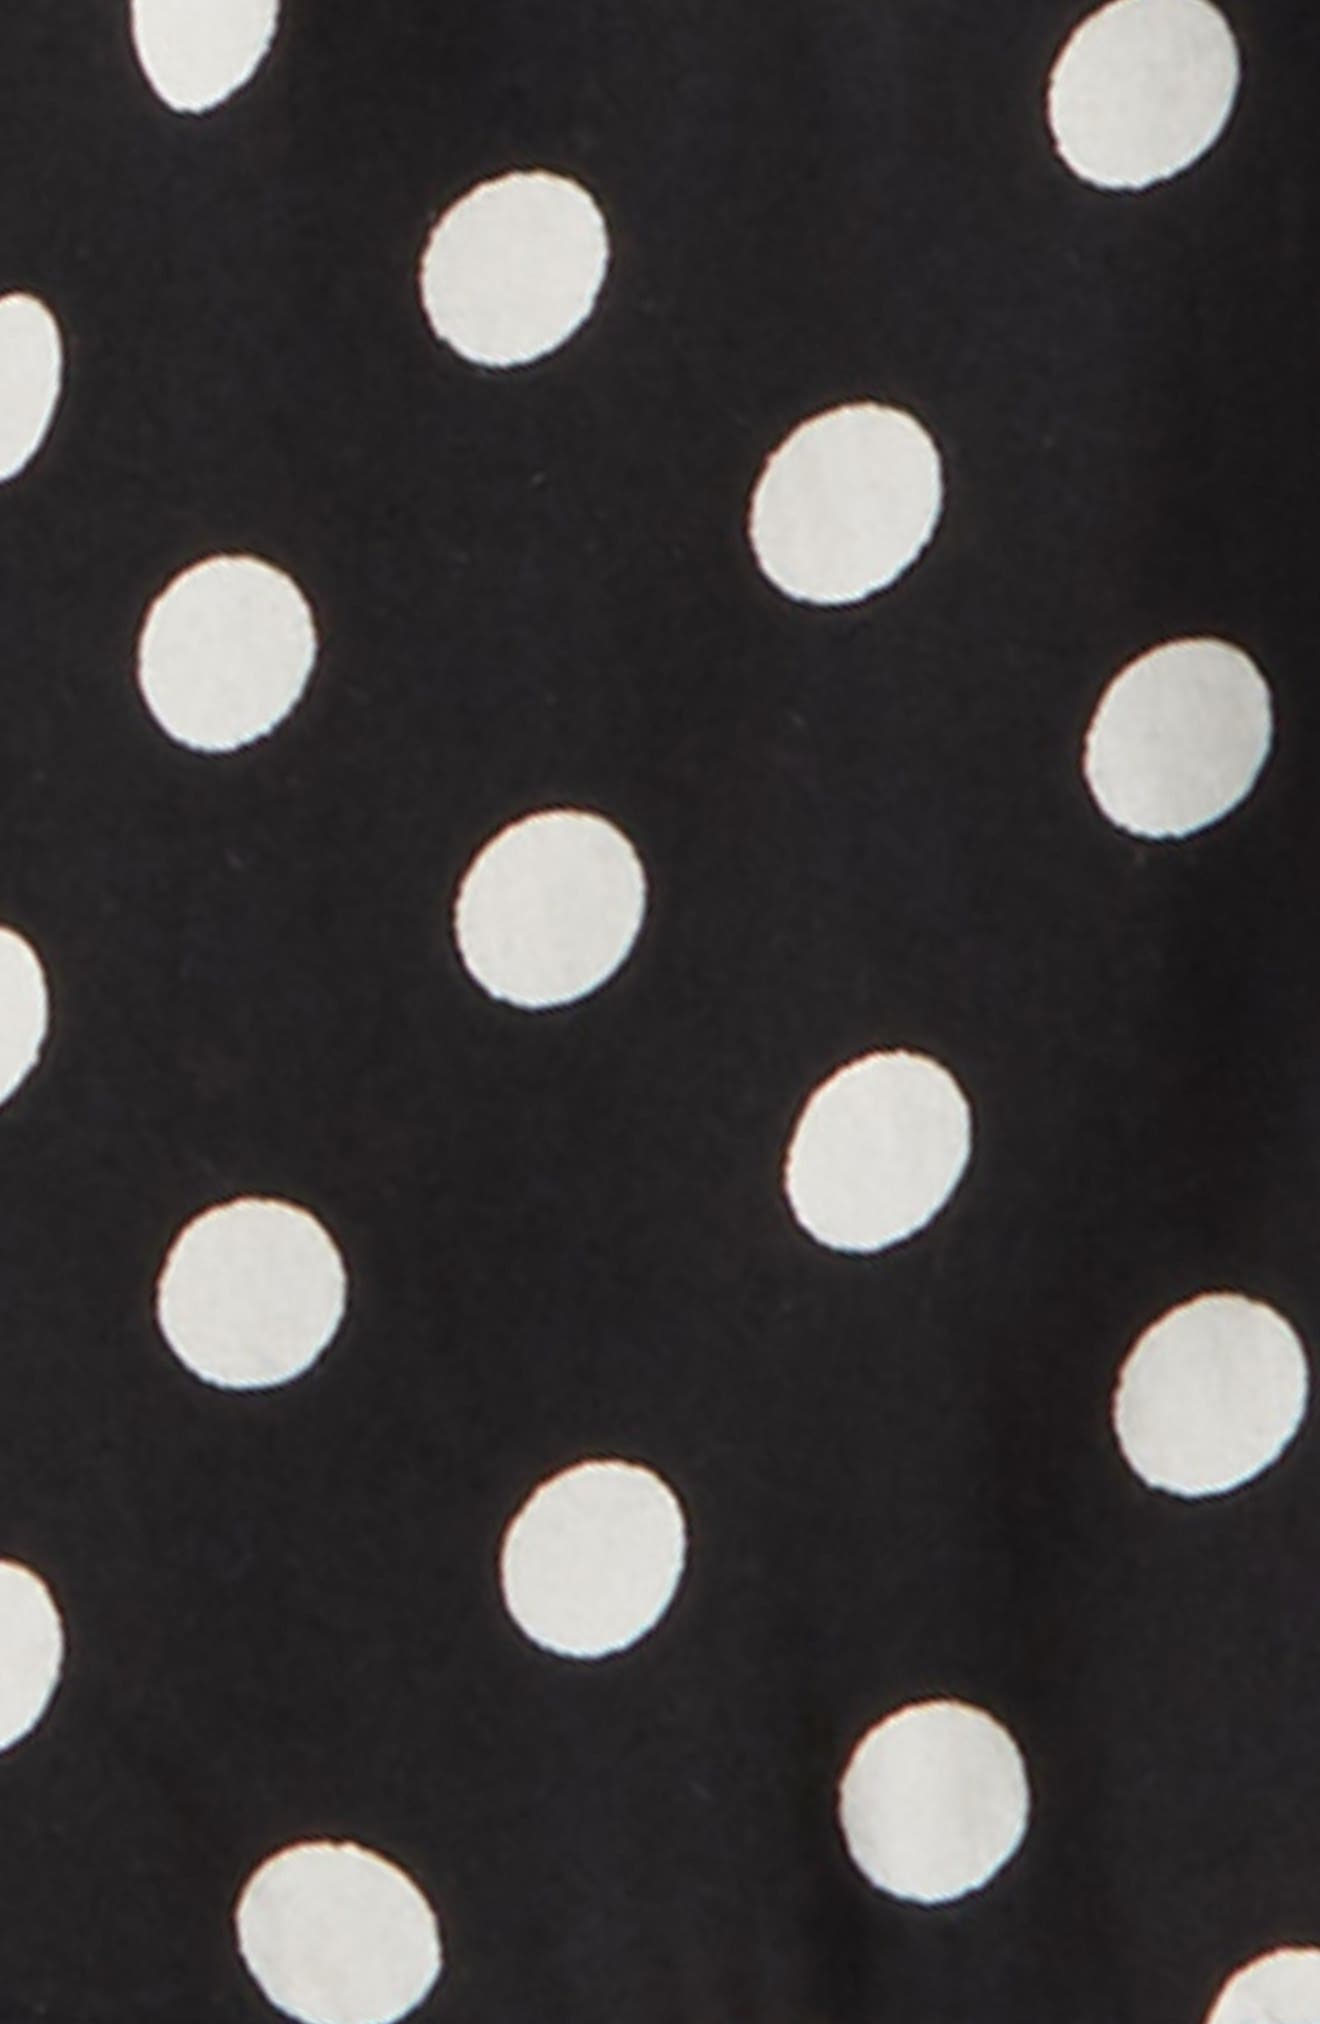 Polka Dot Bell Sleeve Top,                             Alternate thumbnail 2, color,                             001